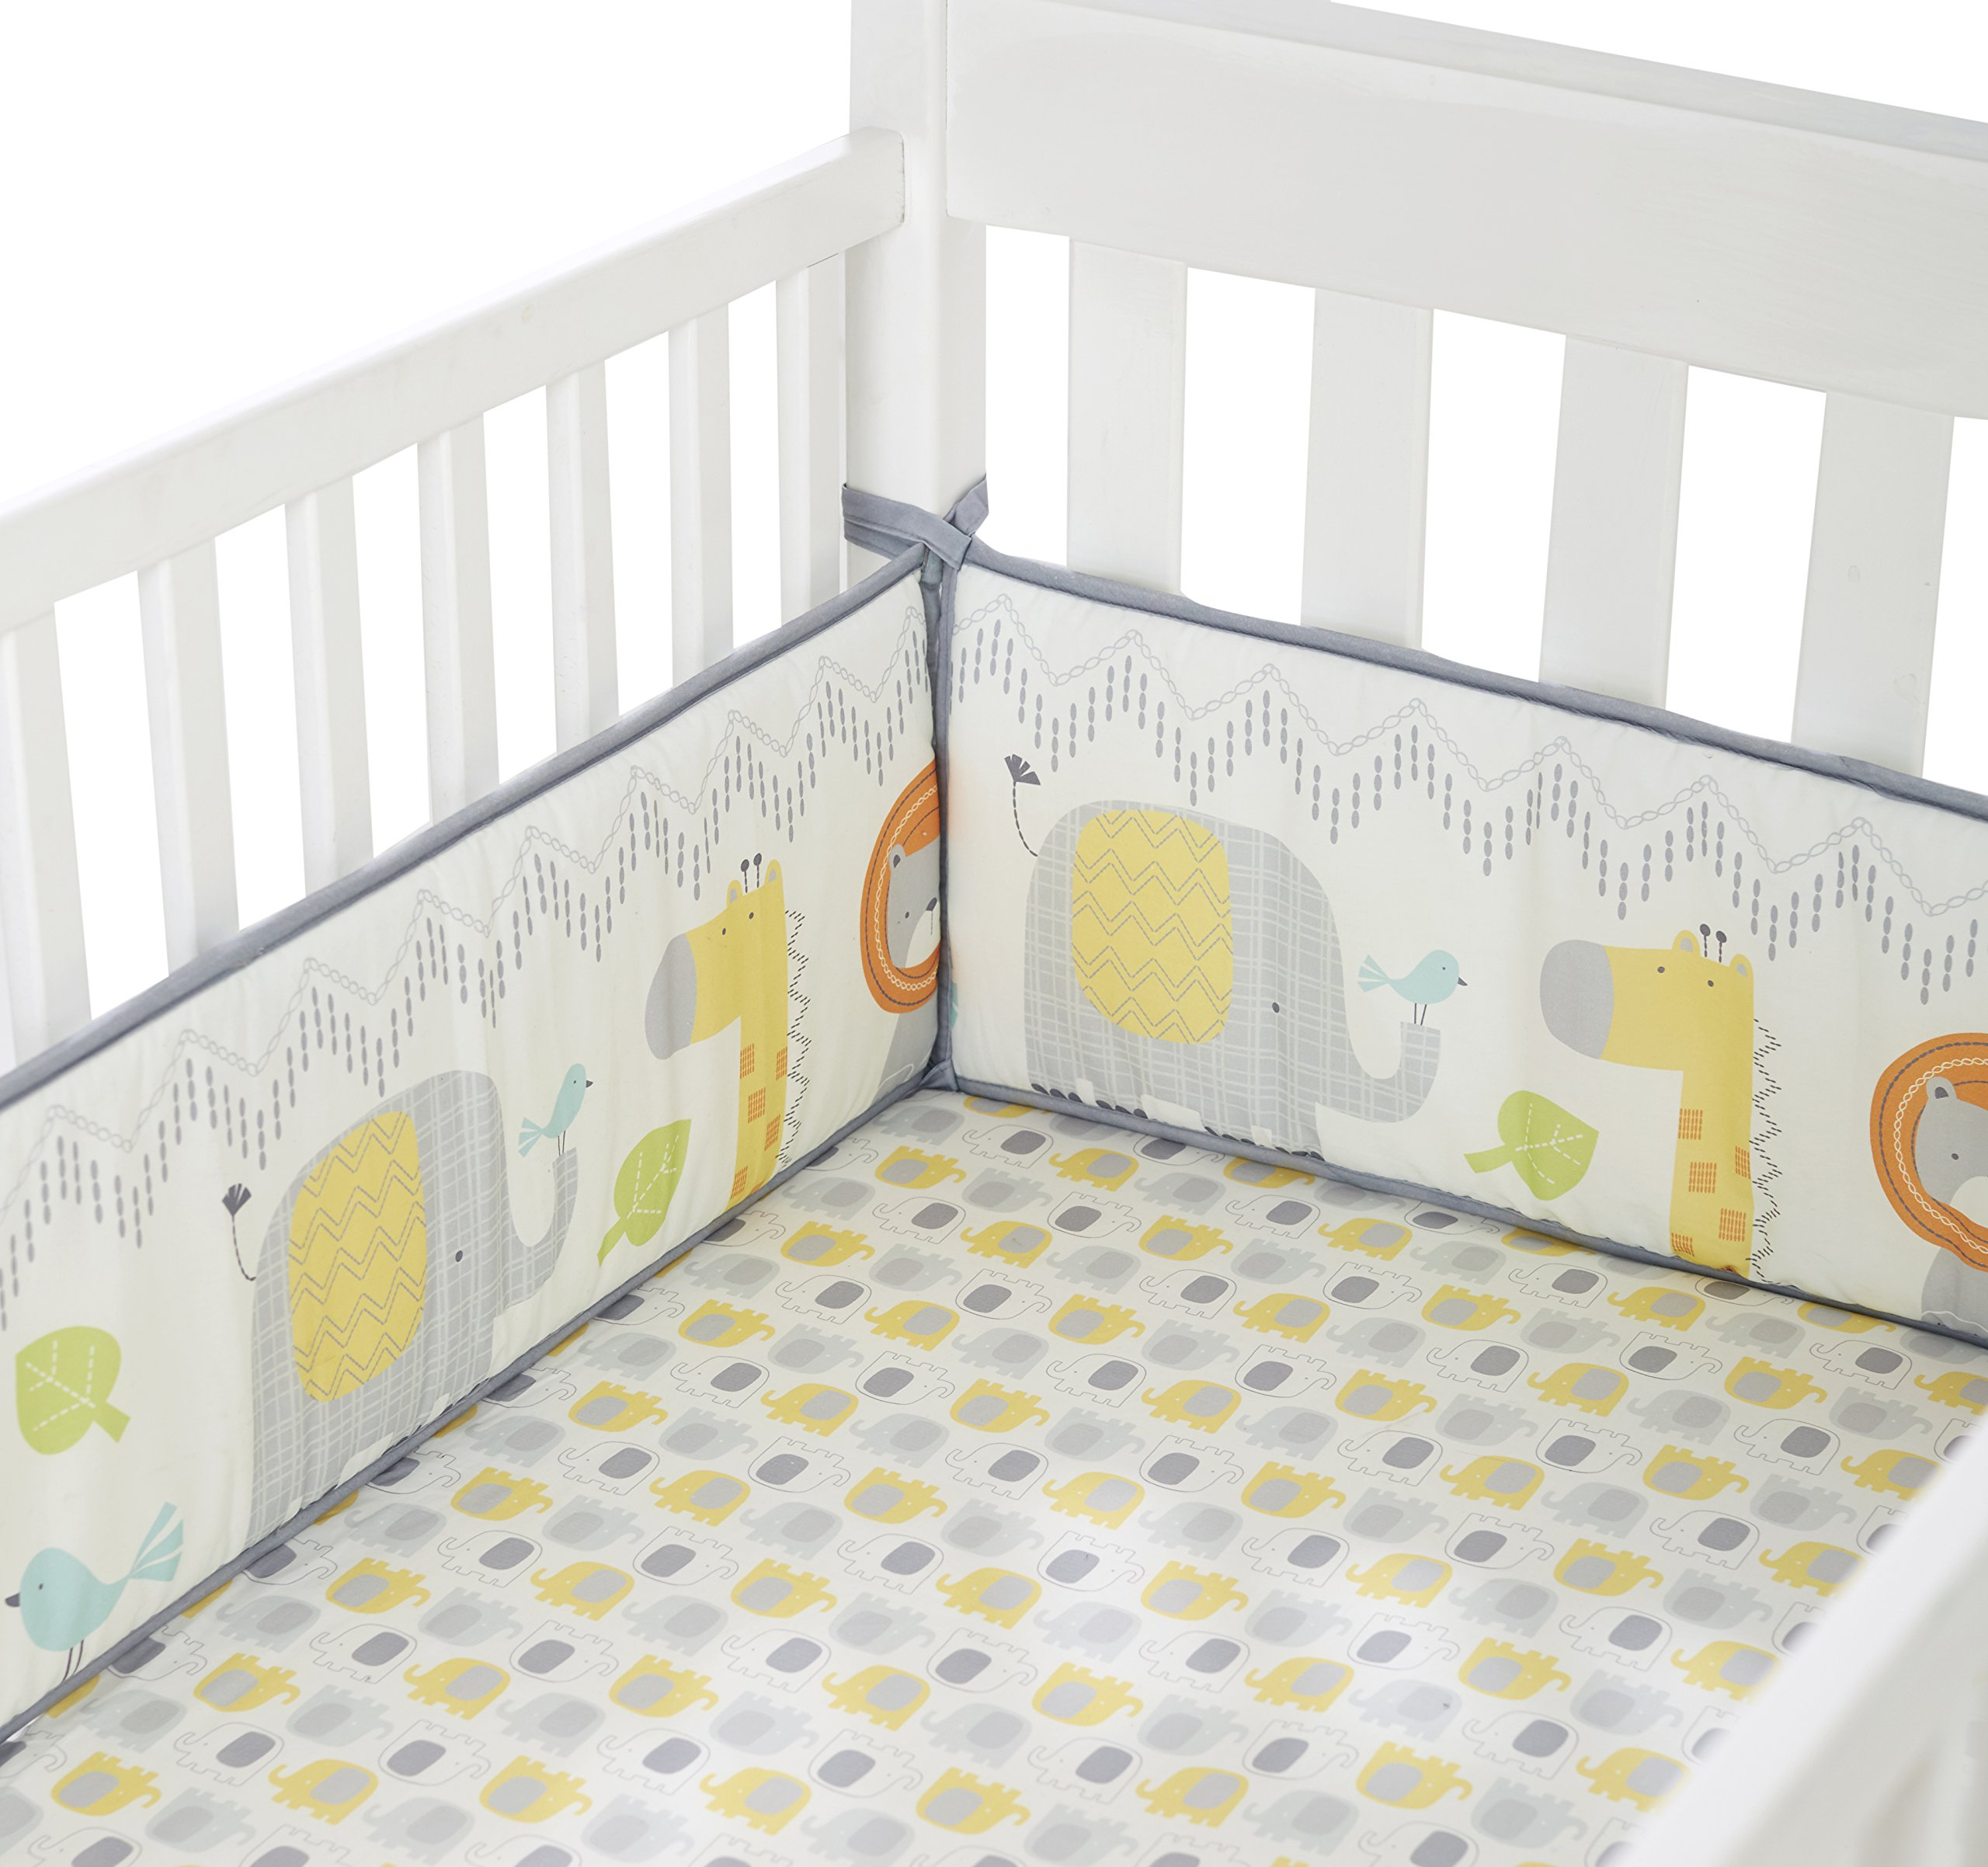 Cuddletime Globetrotter Crib Bumper, Gray by Cuddletime